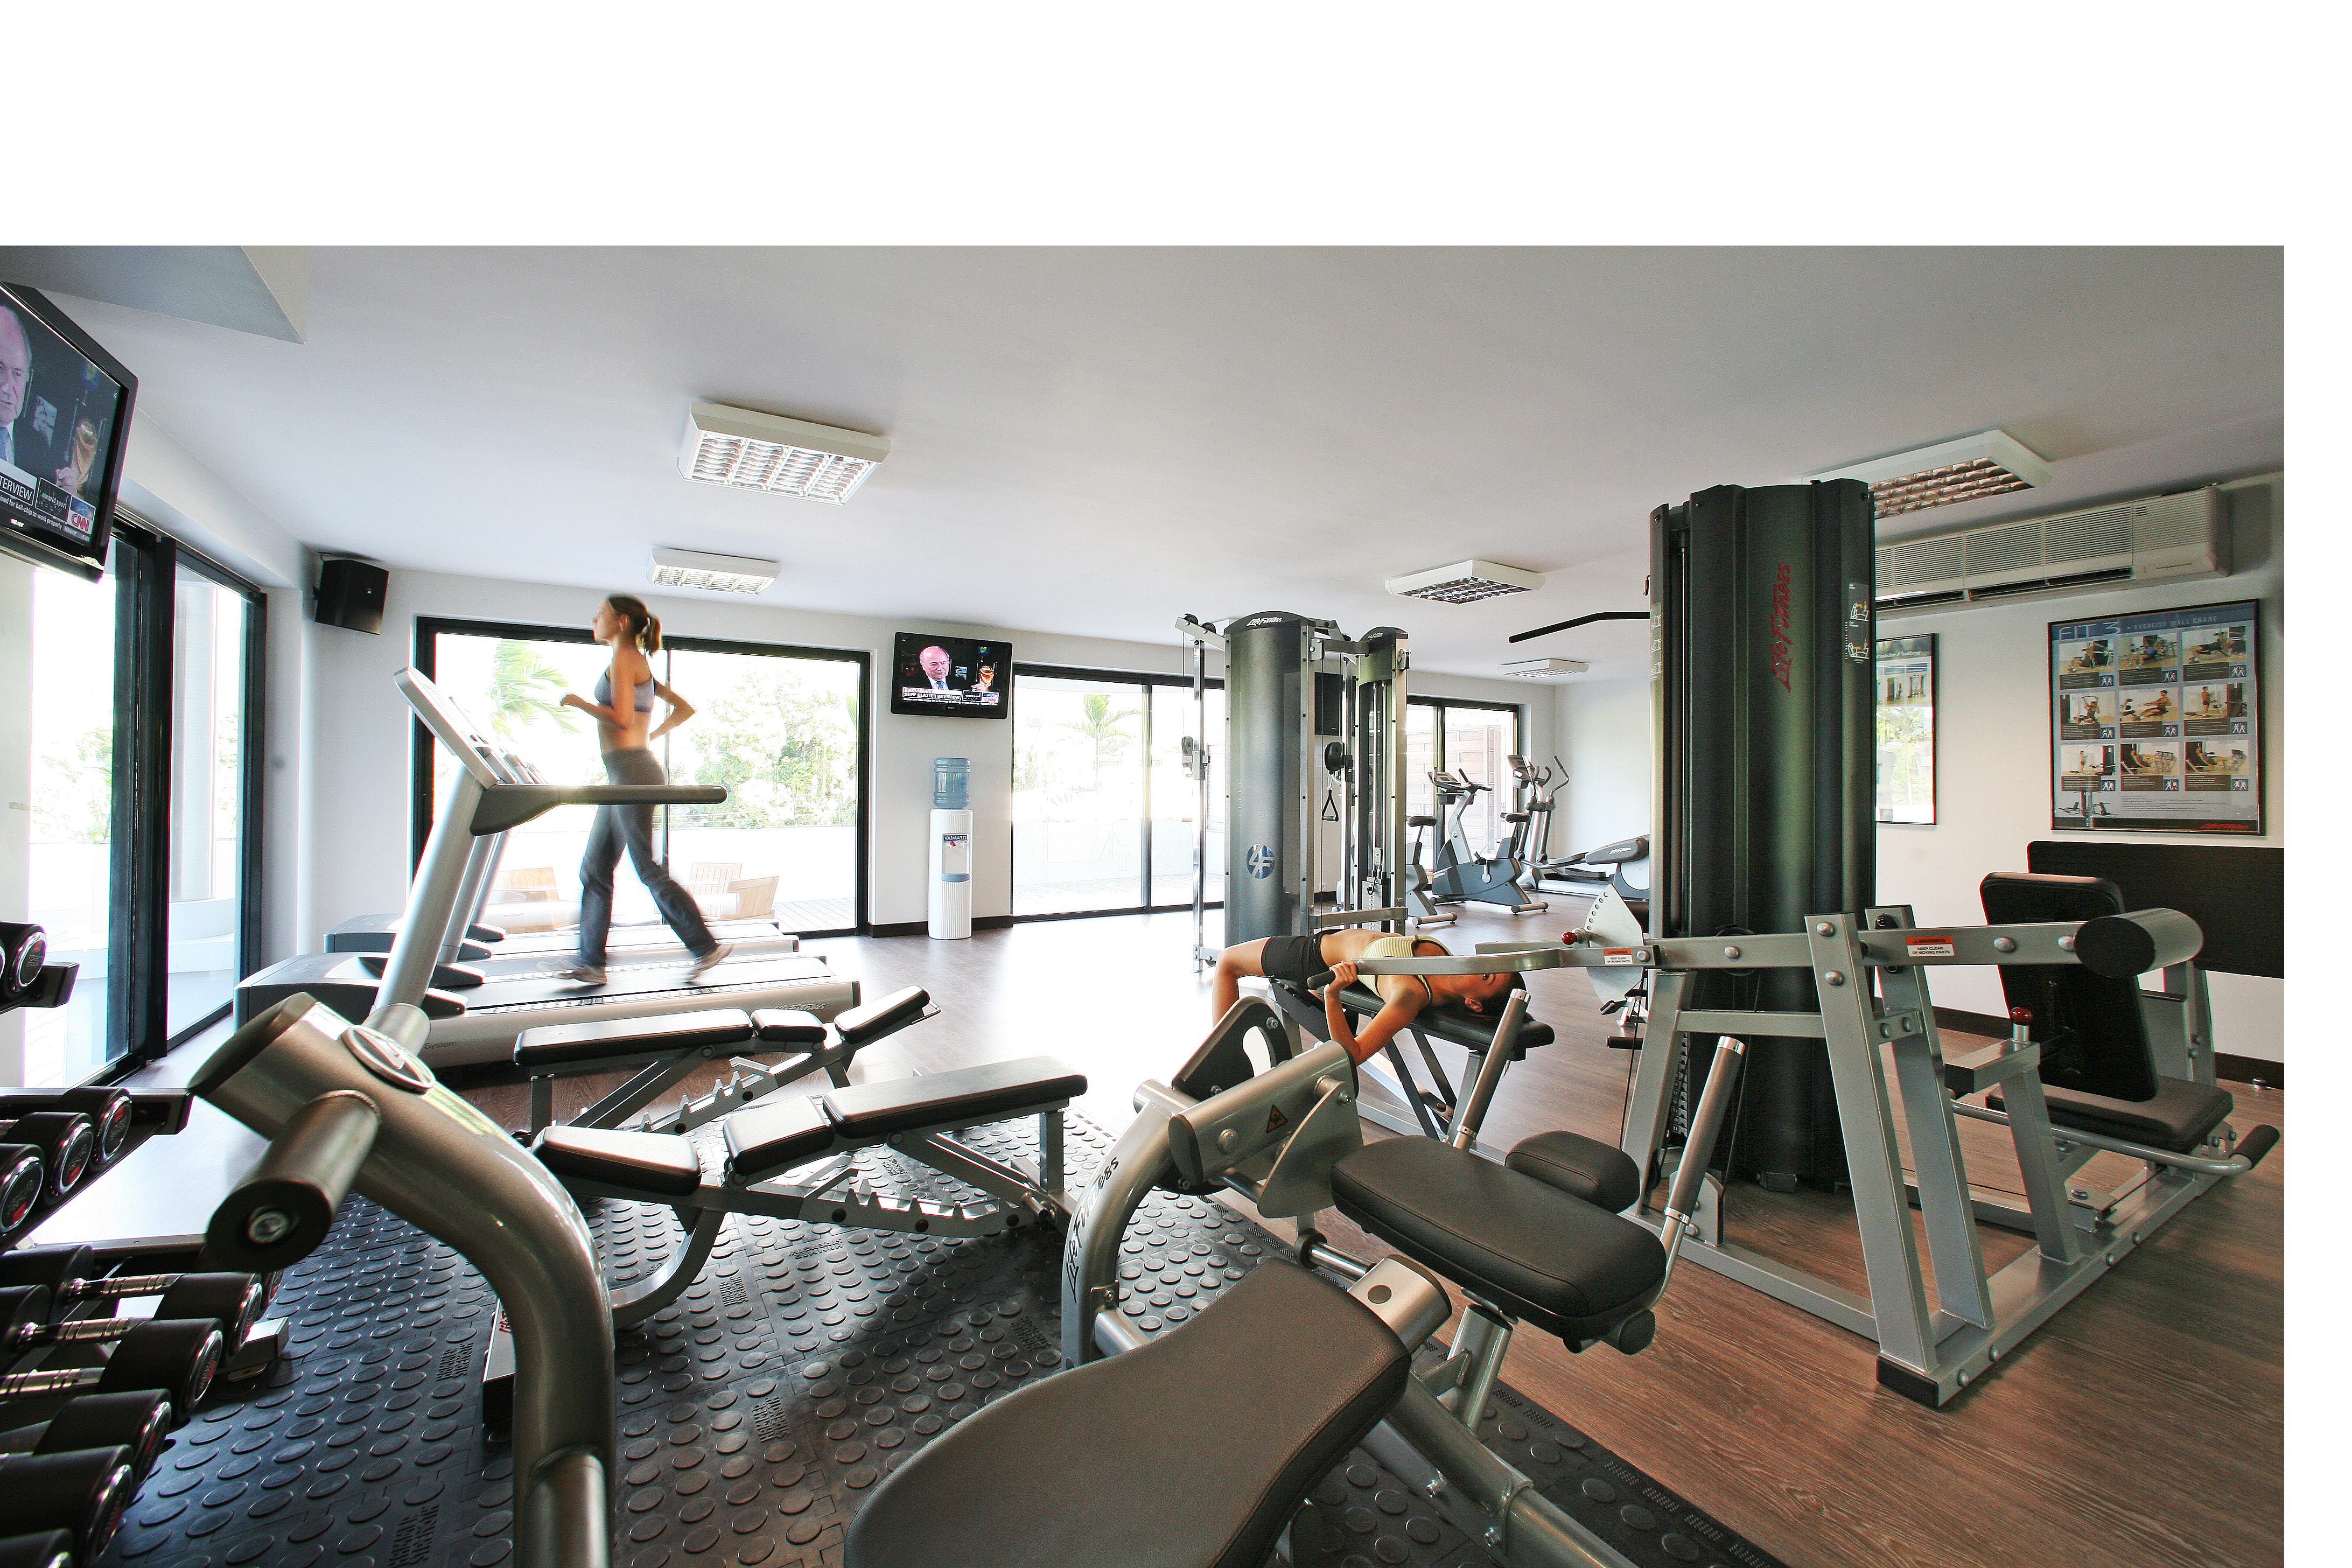 https://tahititourisme.es/wp-content/uploads/2017/08/Fitness-centre-2.jpg